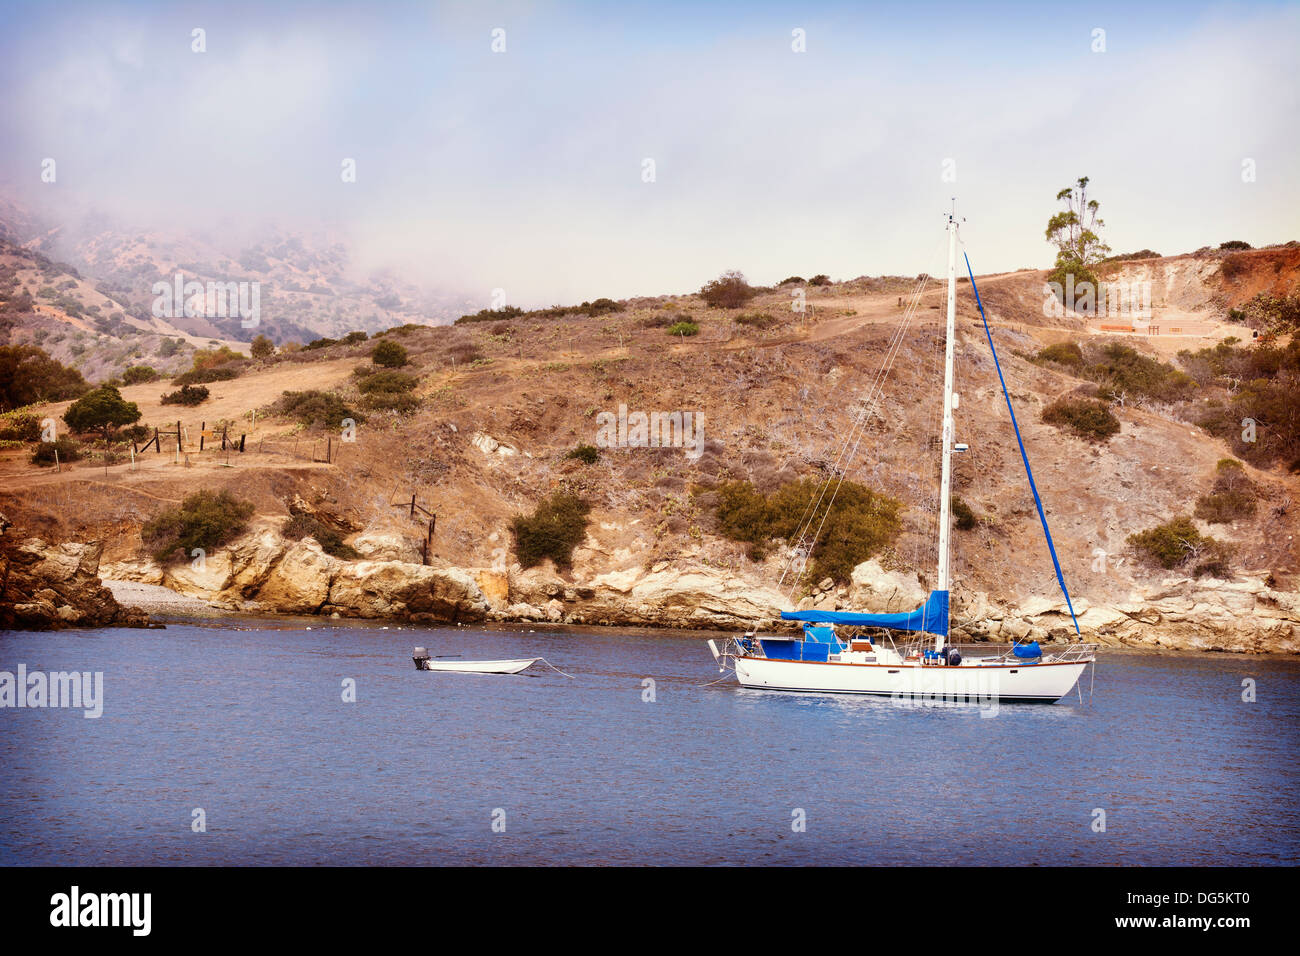 A sailboat and dingy anchored in a bay at Catalina Island. - Stock Image